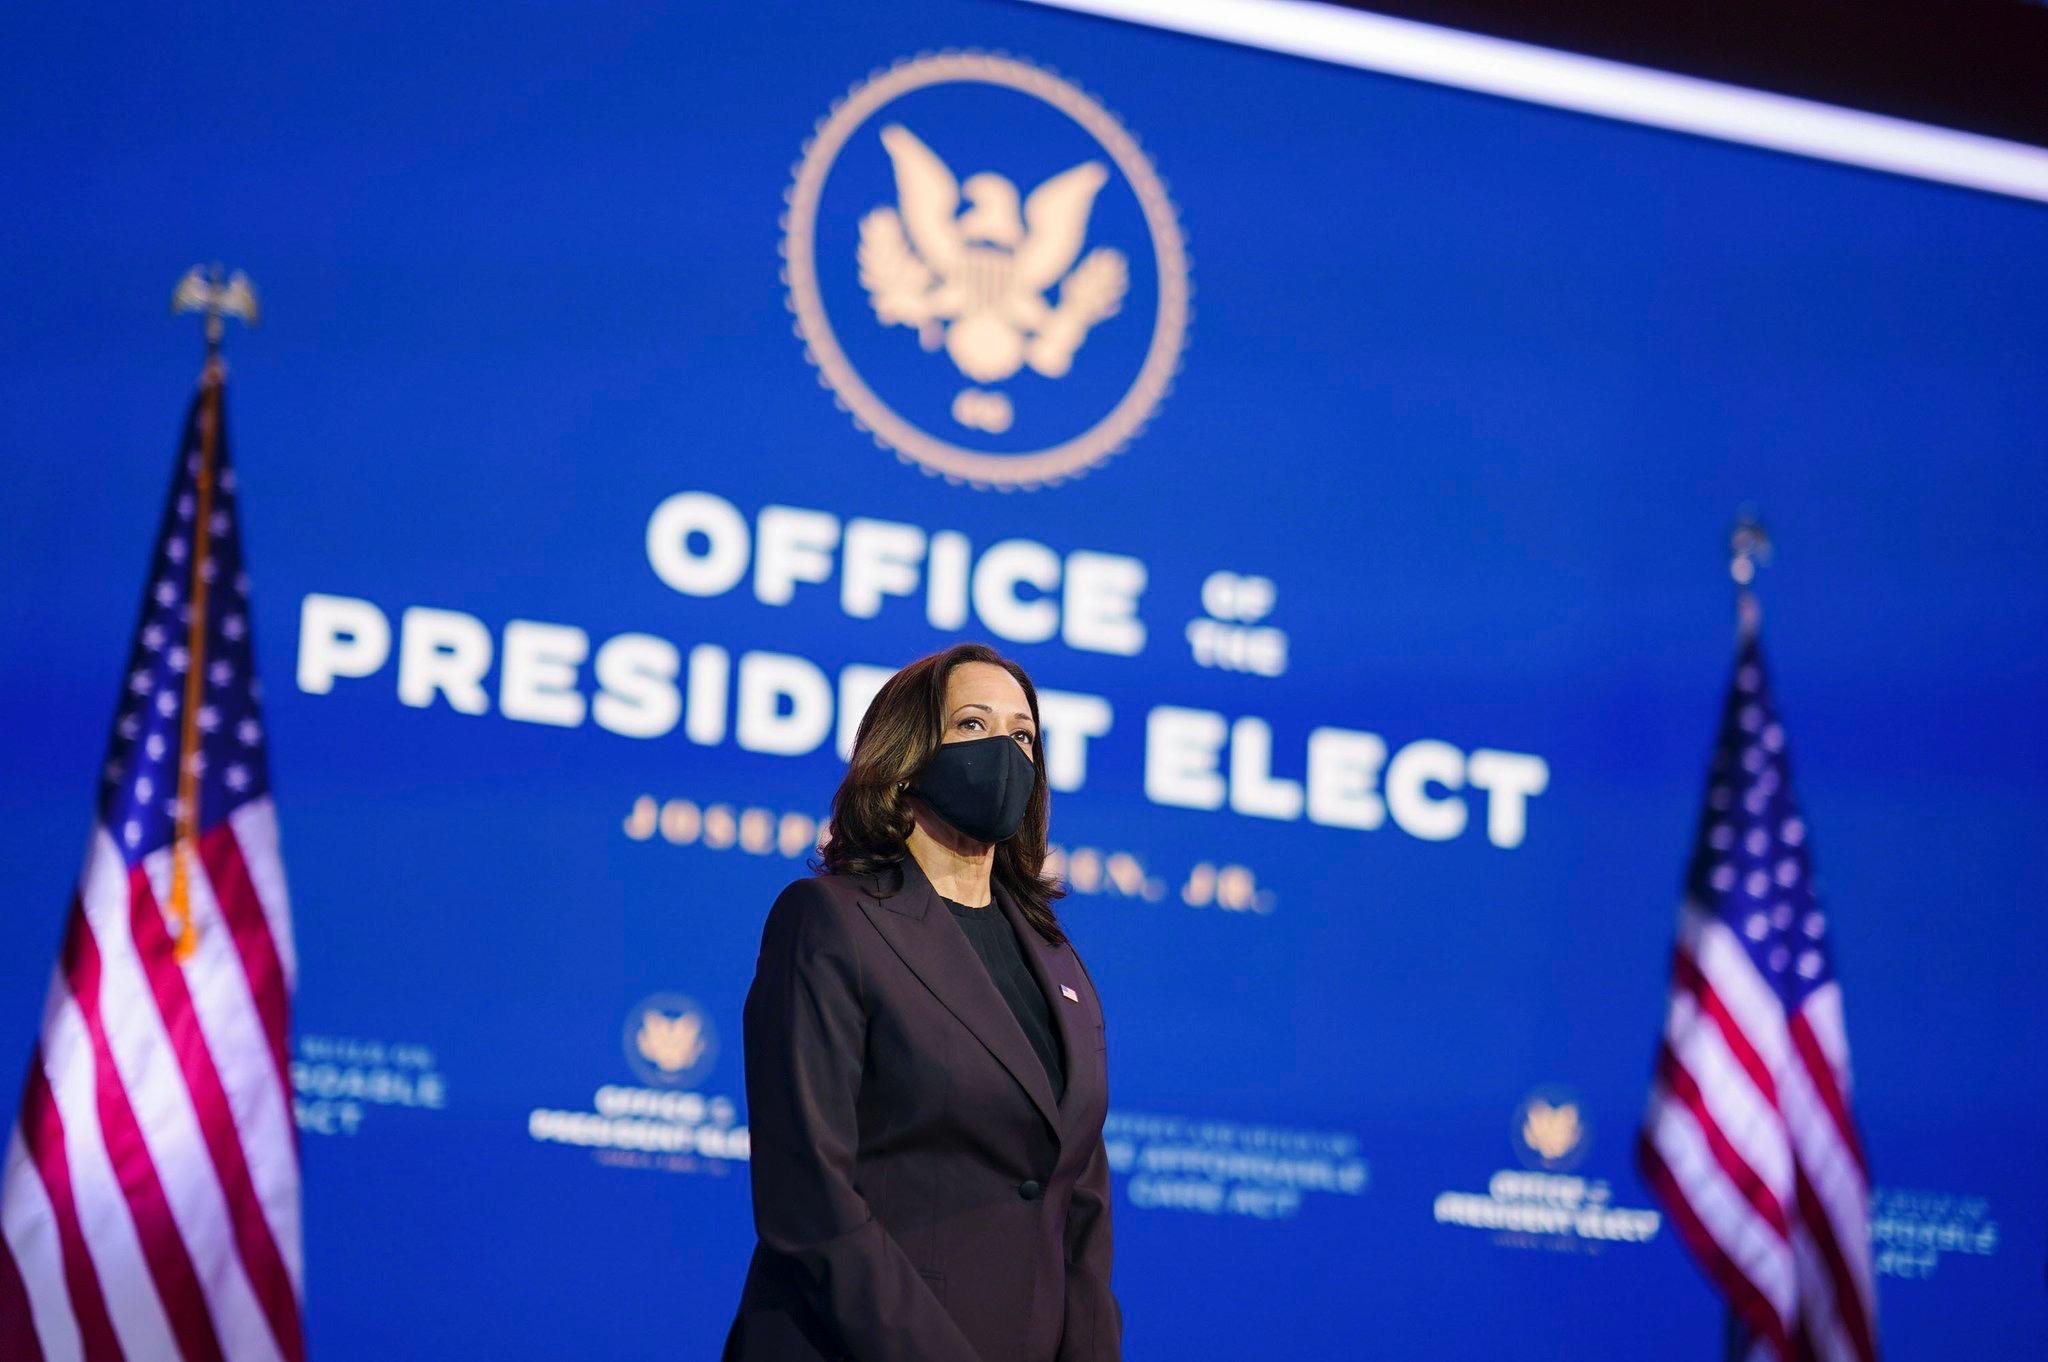 Setting a Path Forward: Sen. Kamala Harris' Historic VP Win Inspires, Motivates Women of Color